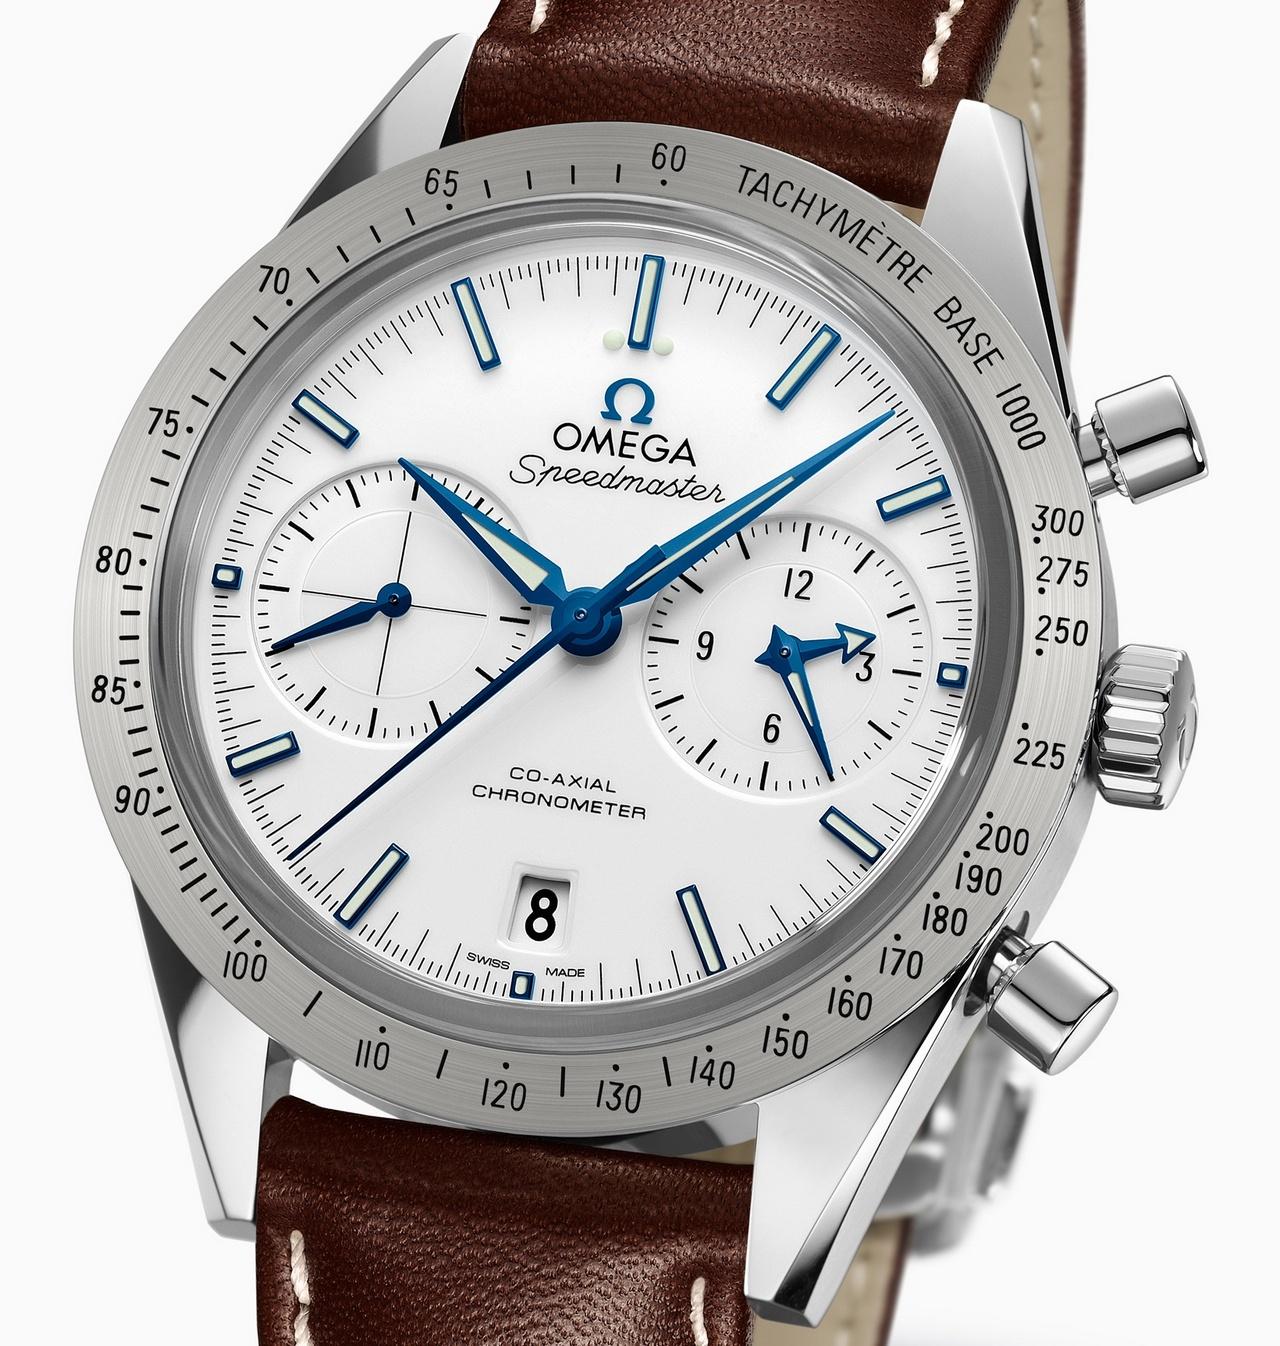 omega-speedmaster-57-co-axial-chronograph_0-100_30-100